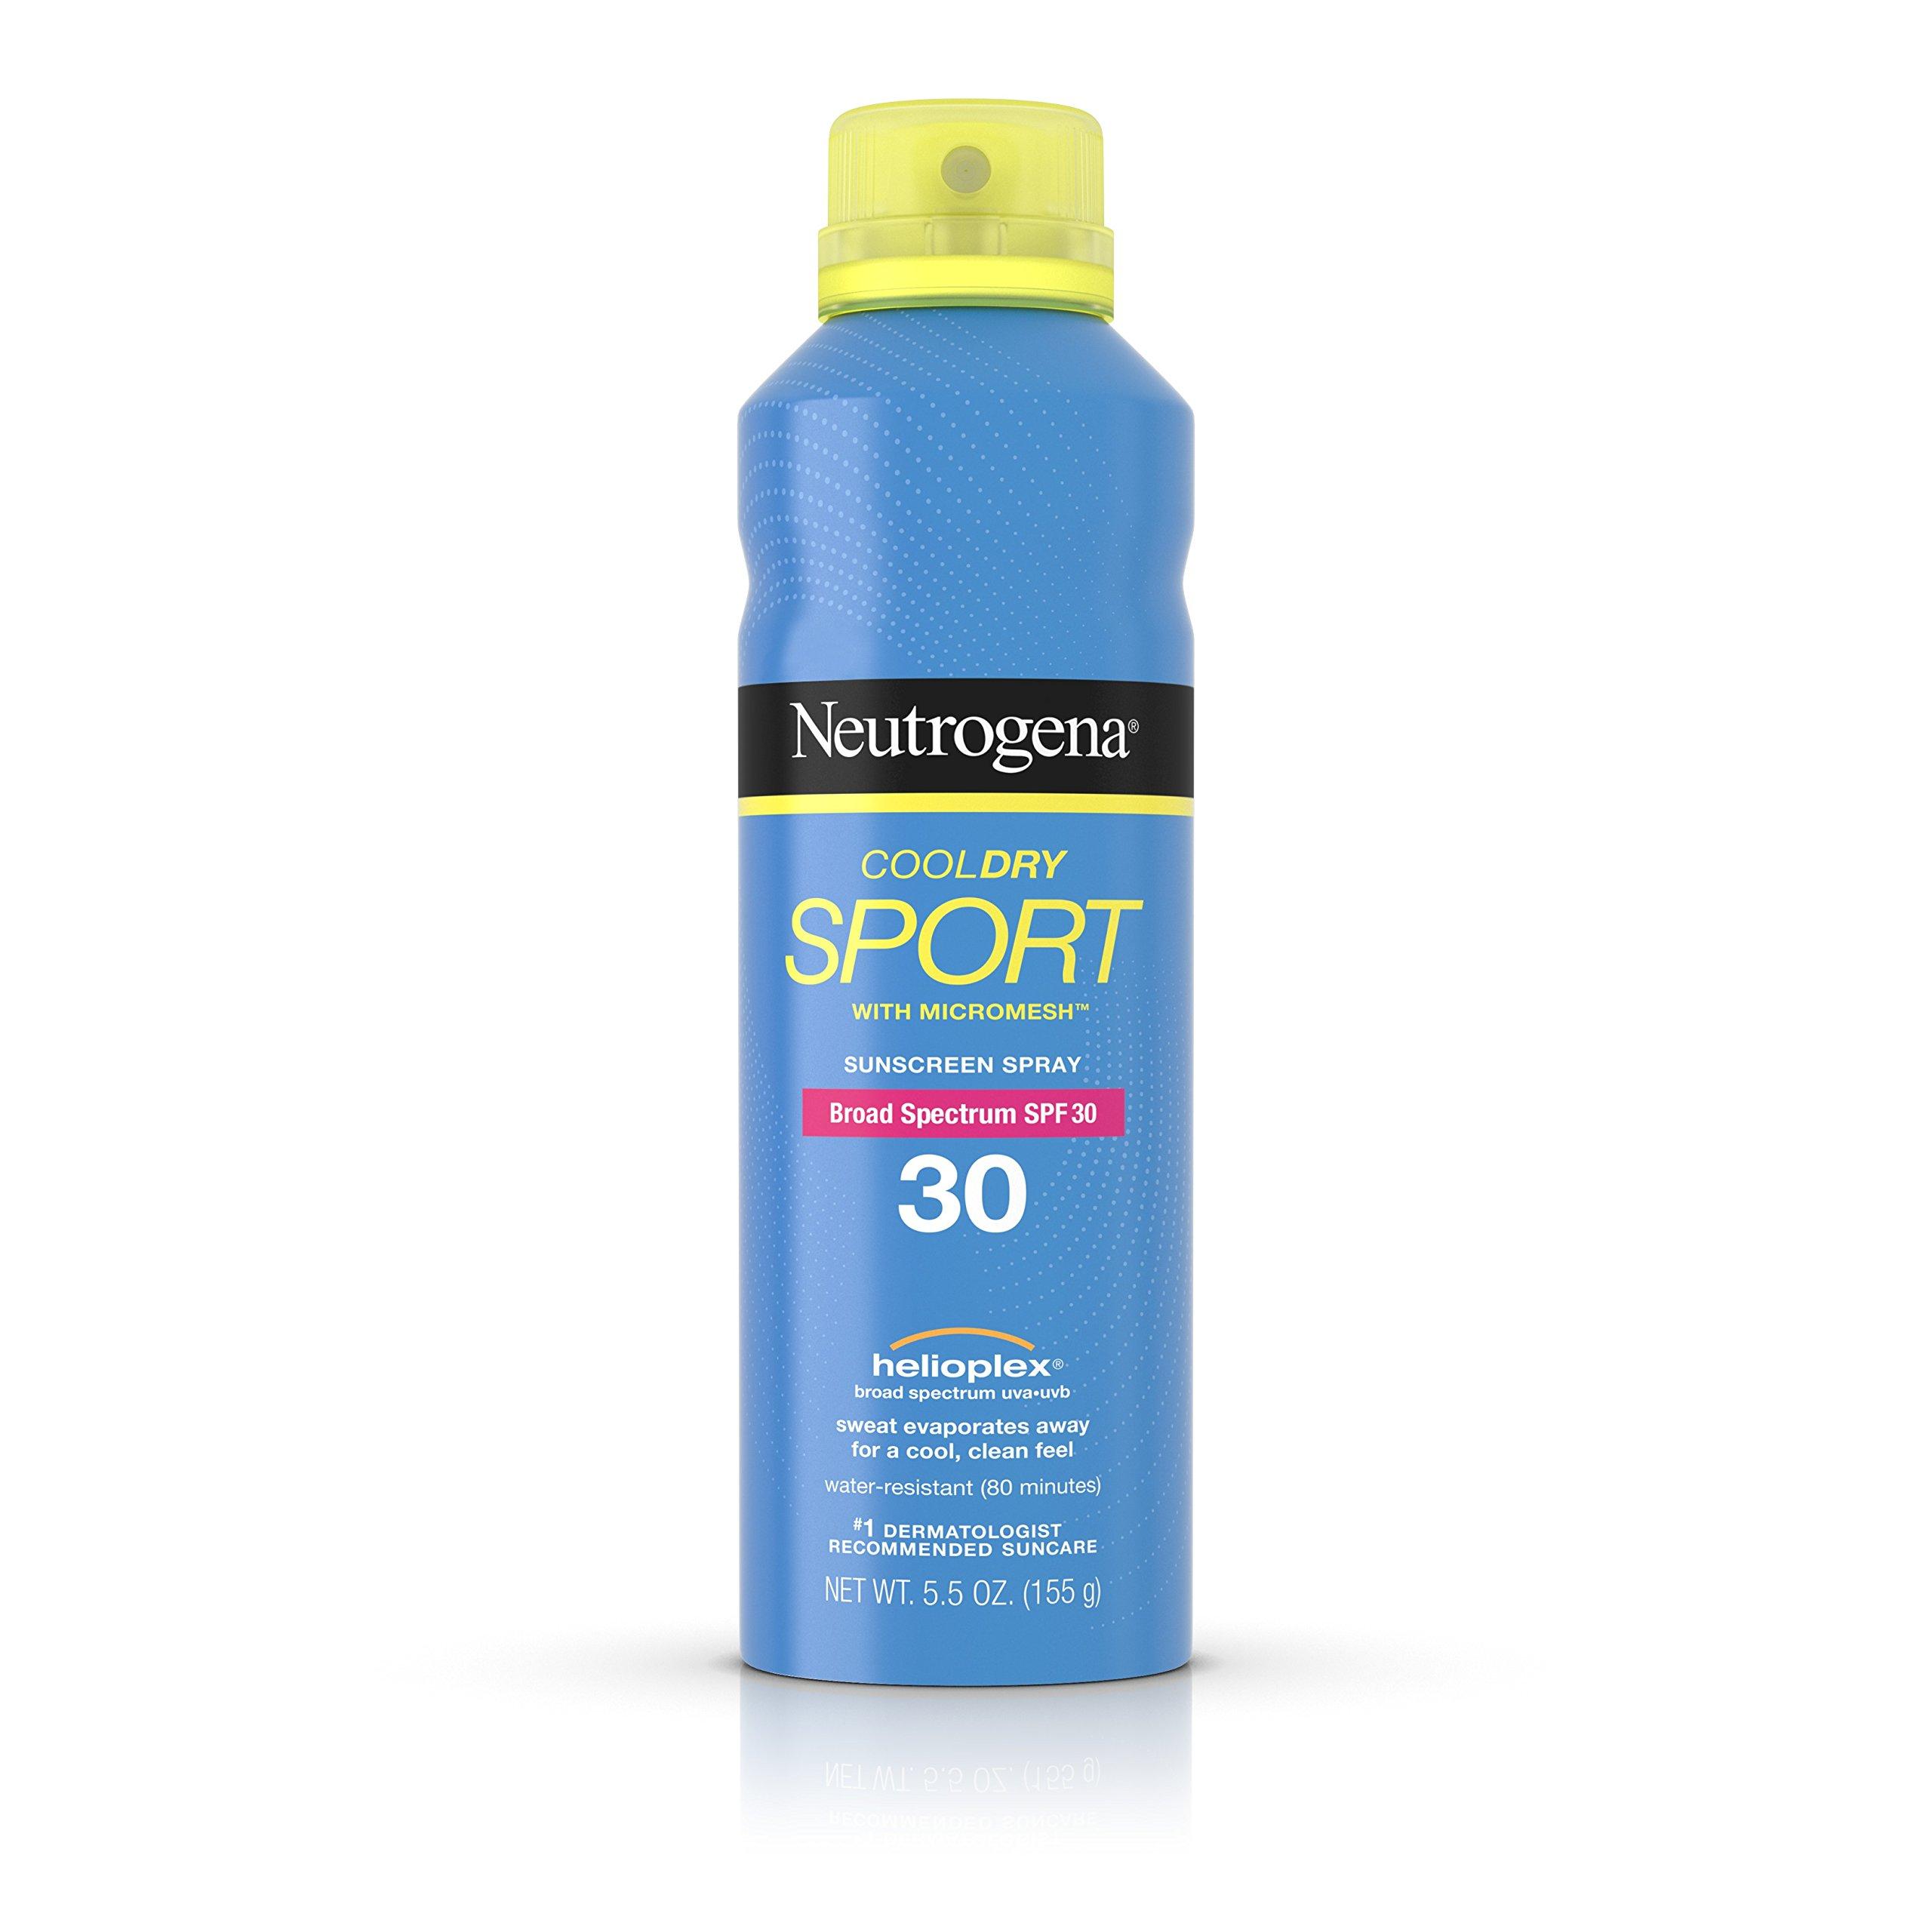 Neutrogena Cooldry Sport Spray Broad Spectrum SPF 30, 5.5 Oz